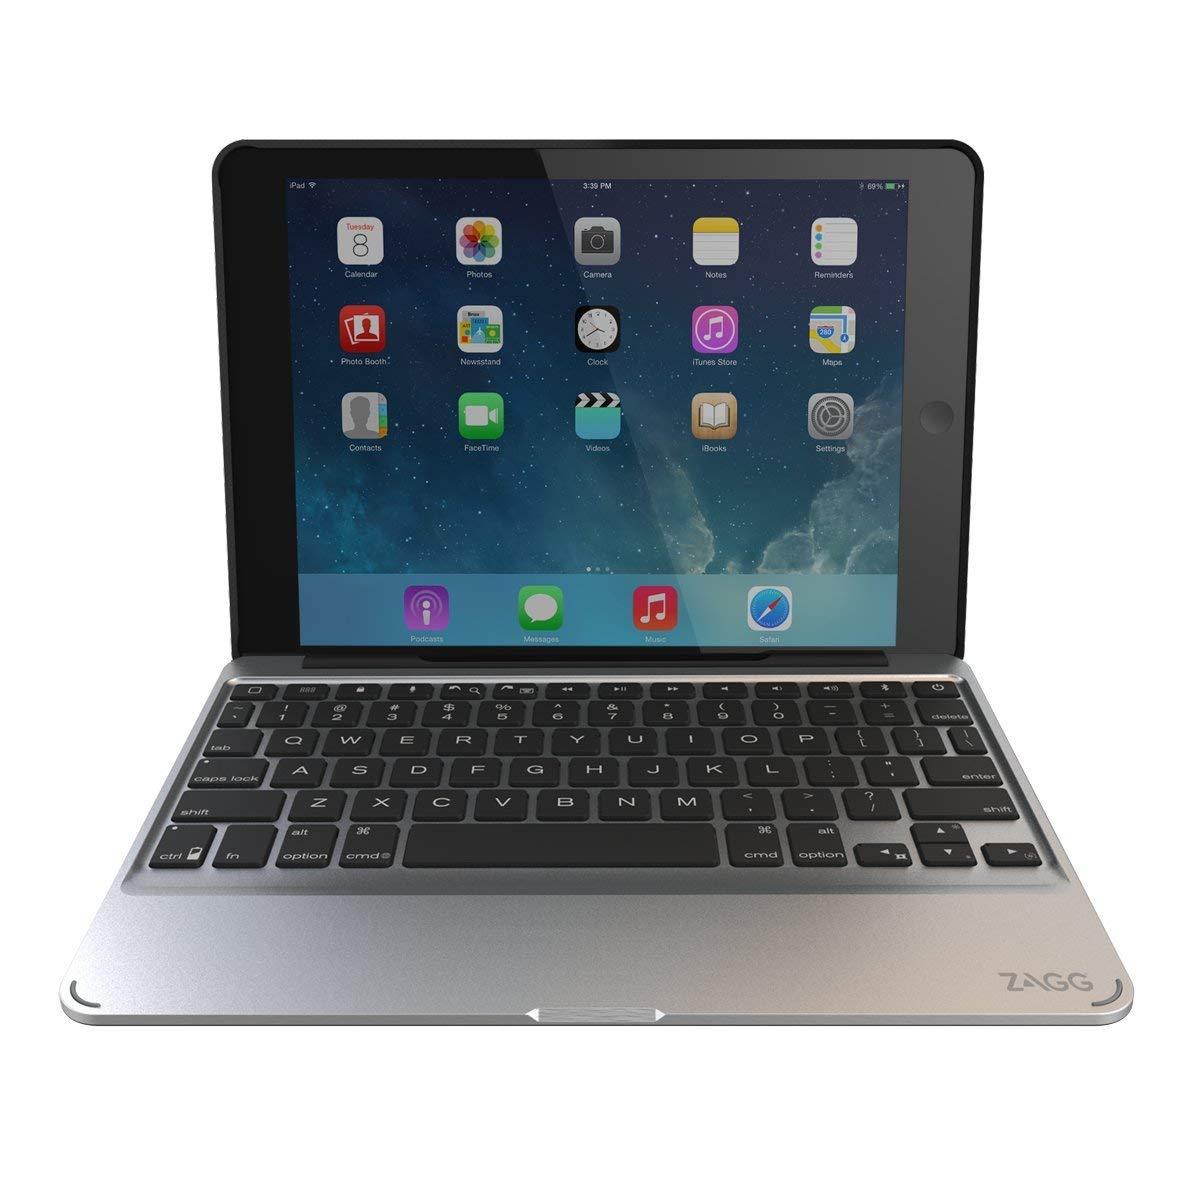 Klávesnice pro iPad mini 1 / 2 / 3 - ZAGGkeys, Slim Book EN